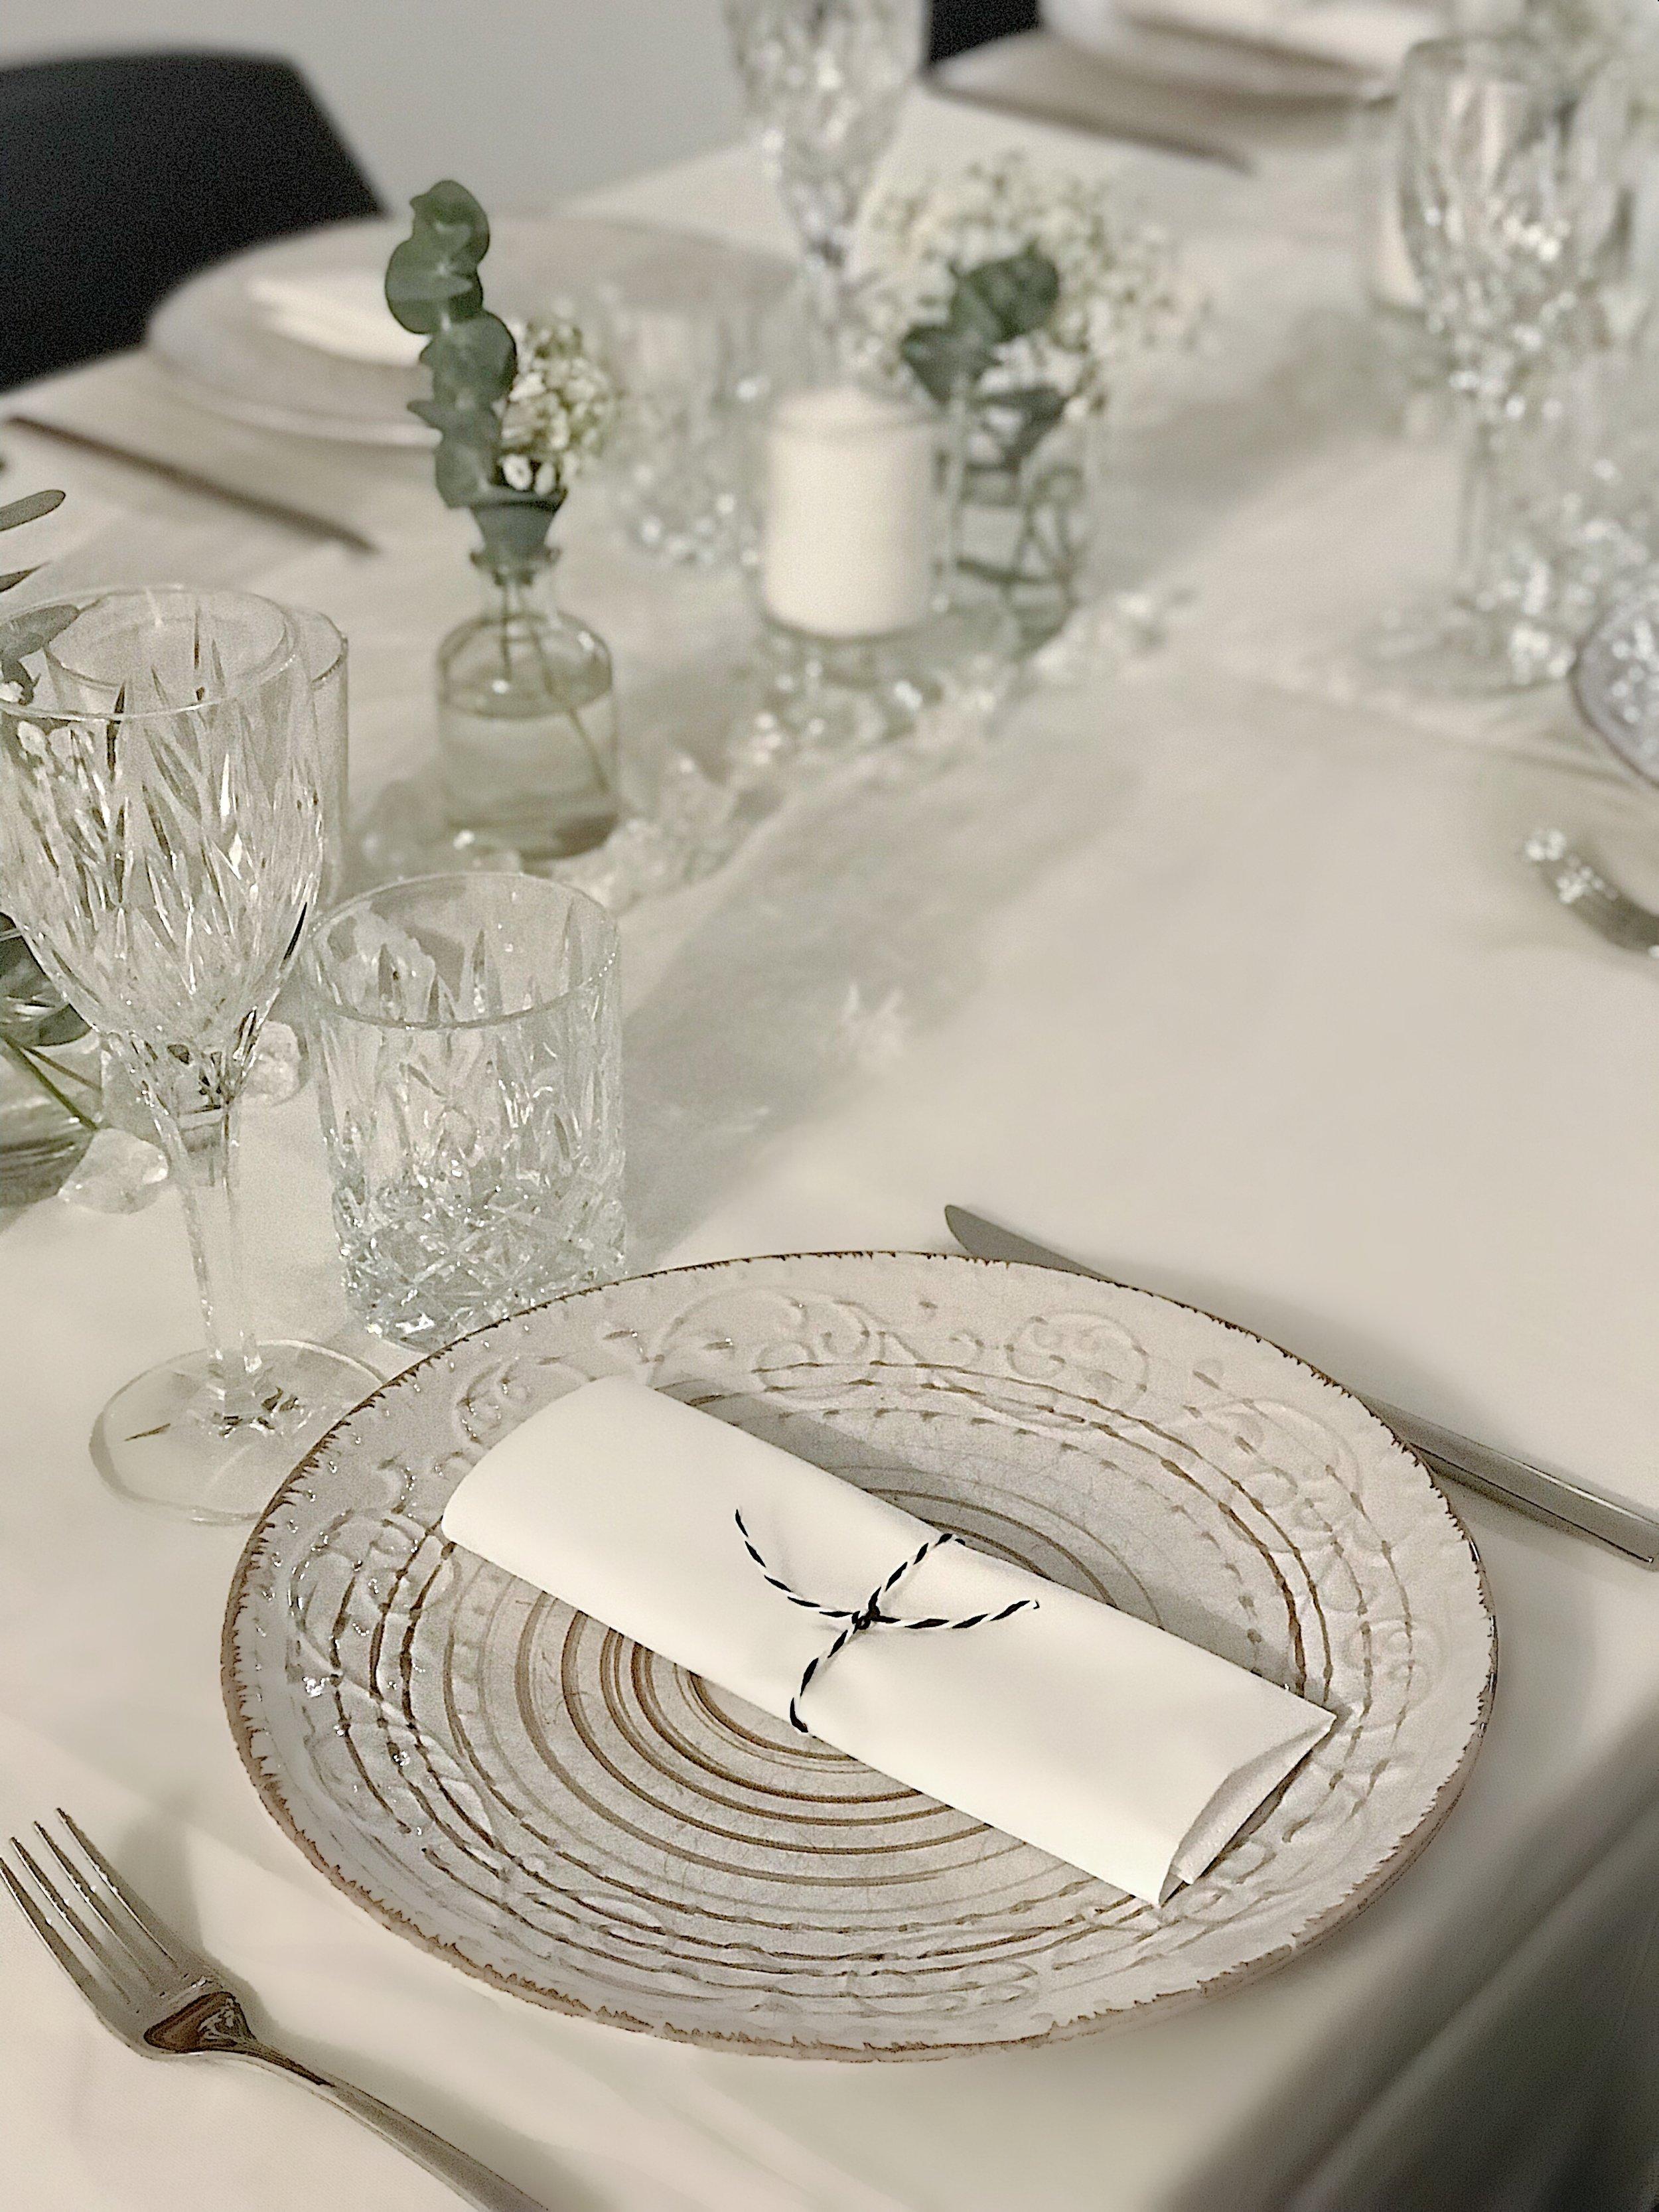 White decor and eucalyptus and white flowers